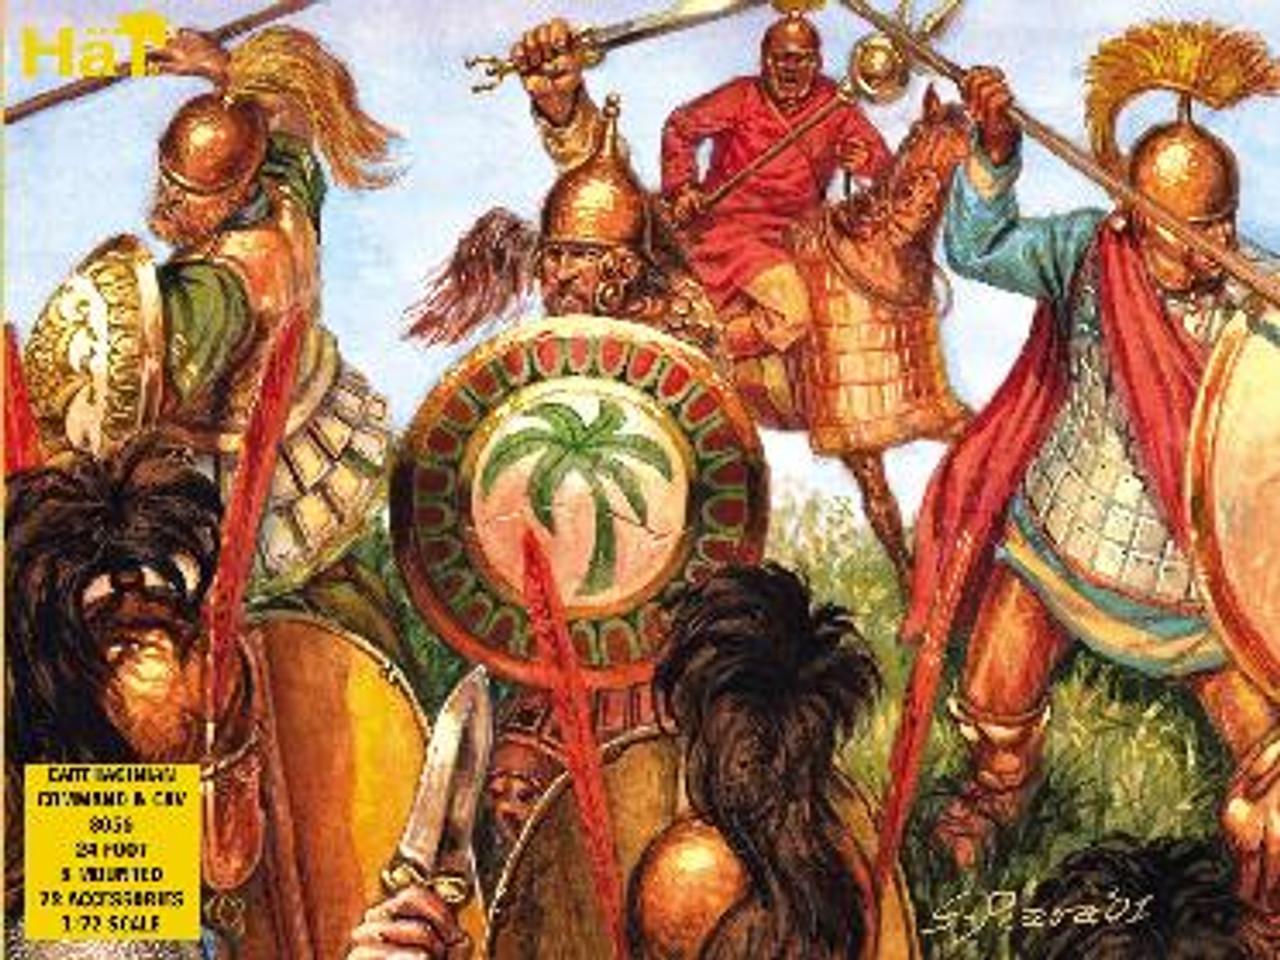 HaT 8056 Carthaginian Command & Cavalry Figures 1:72 Scale